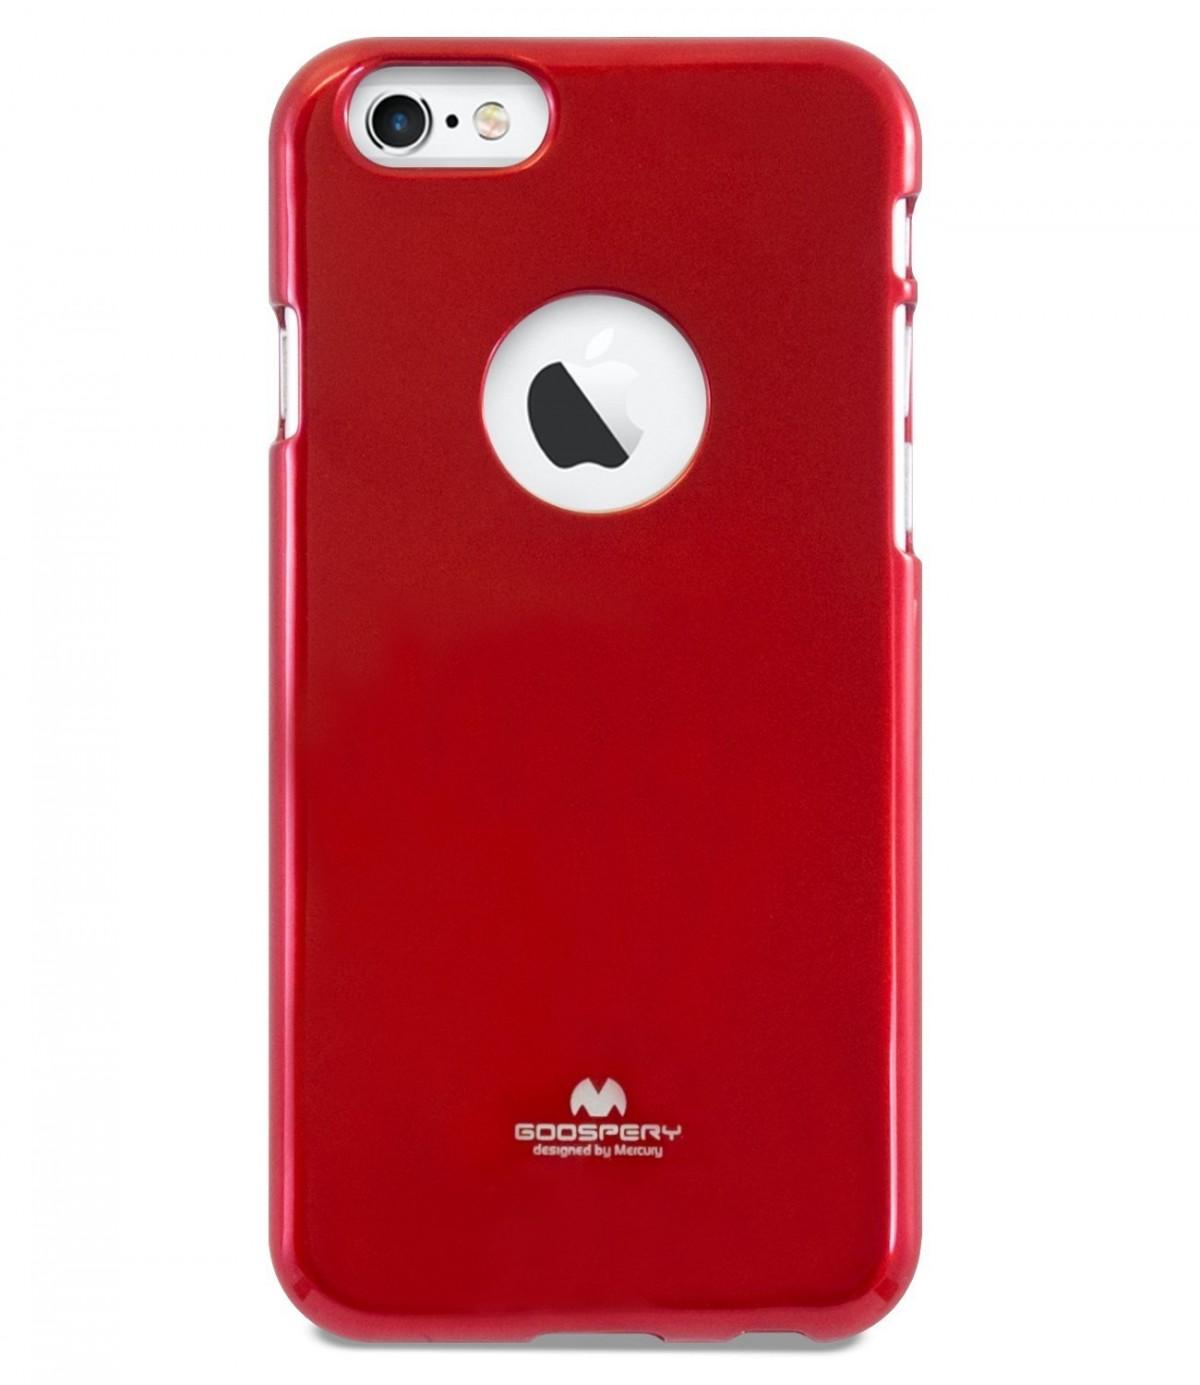 Pouzdro Mercury Jelly Case iPhone 6 / iPhone 6s silikon červené